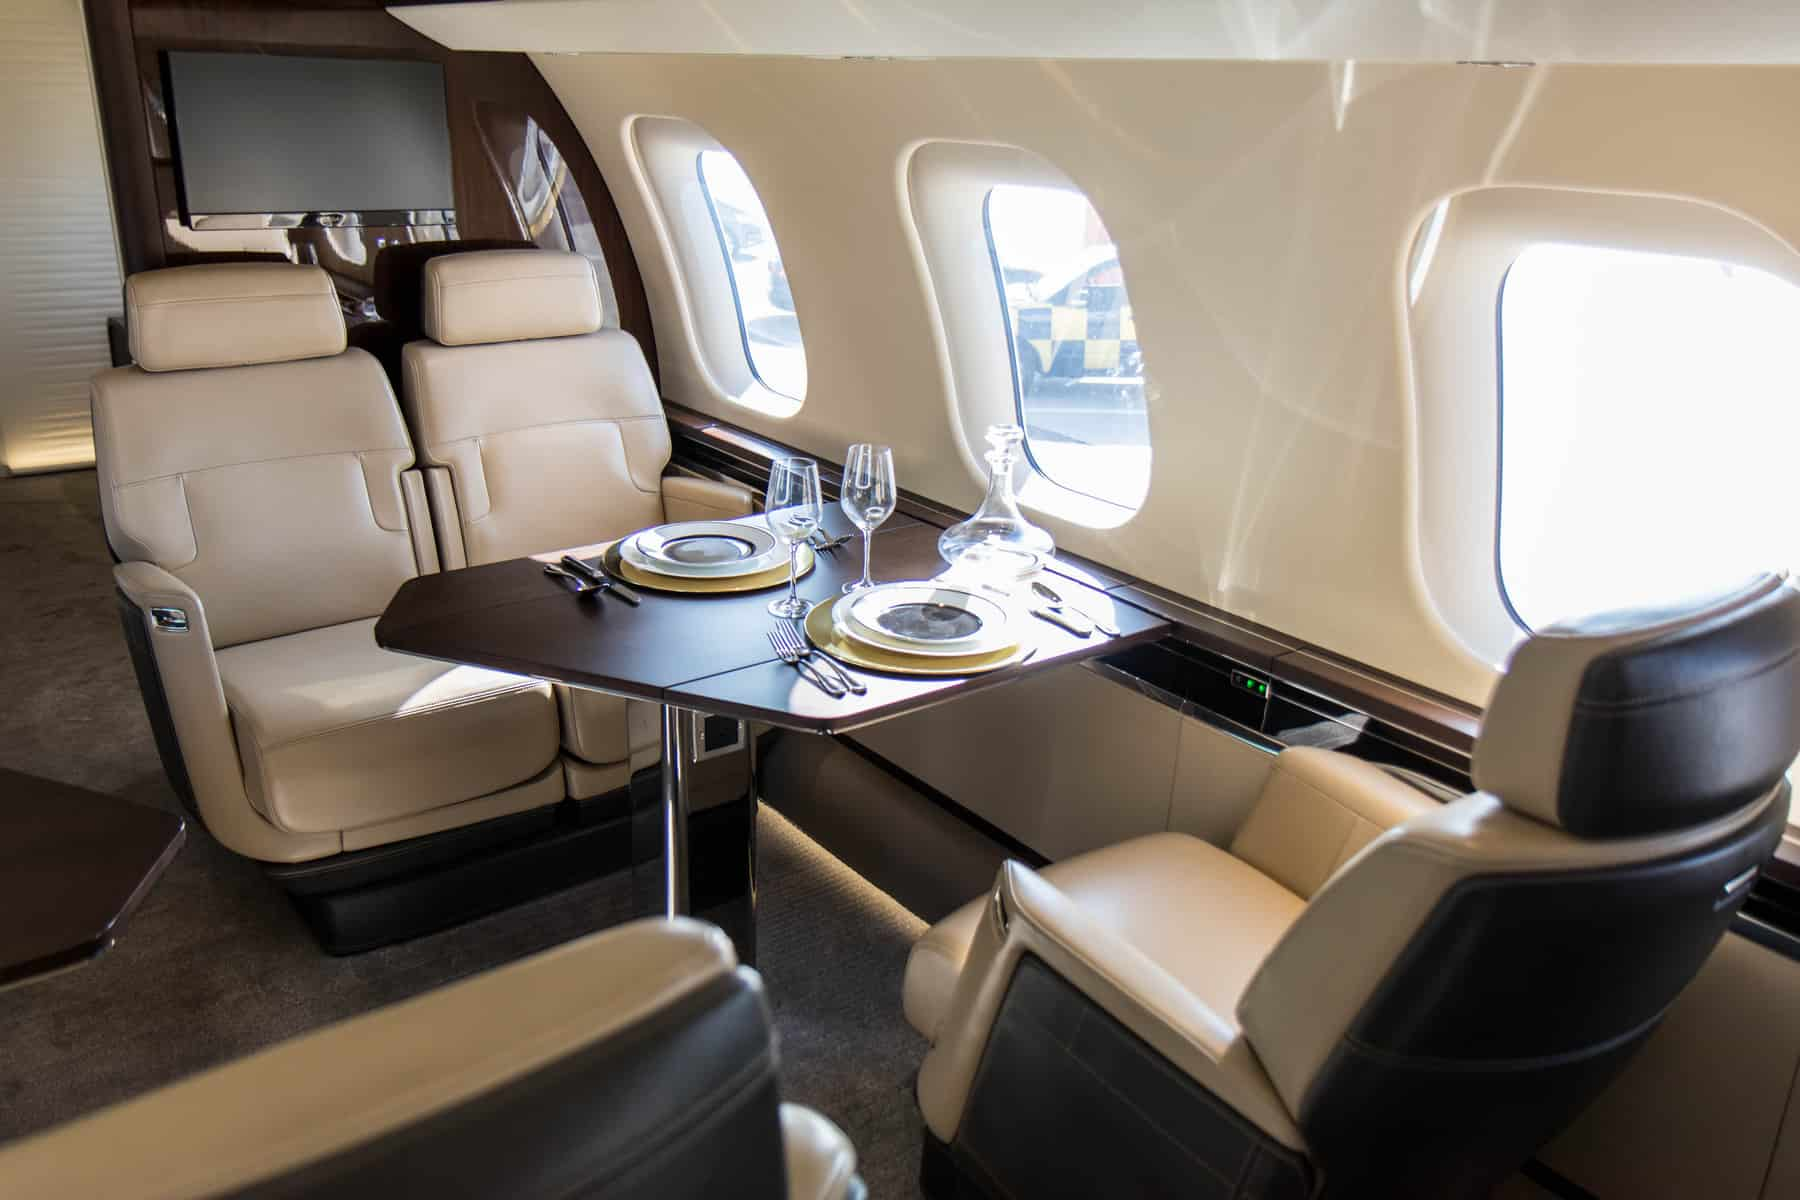 Bombardier Global 7500 nuage seats